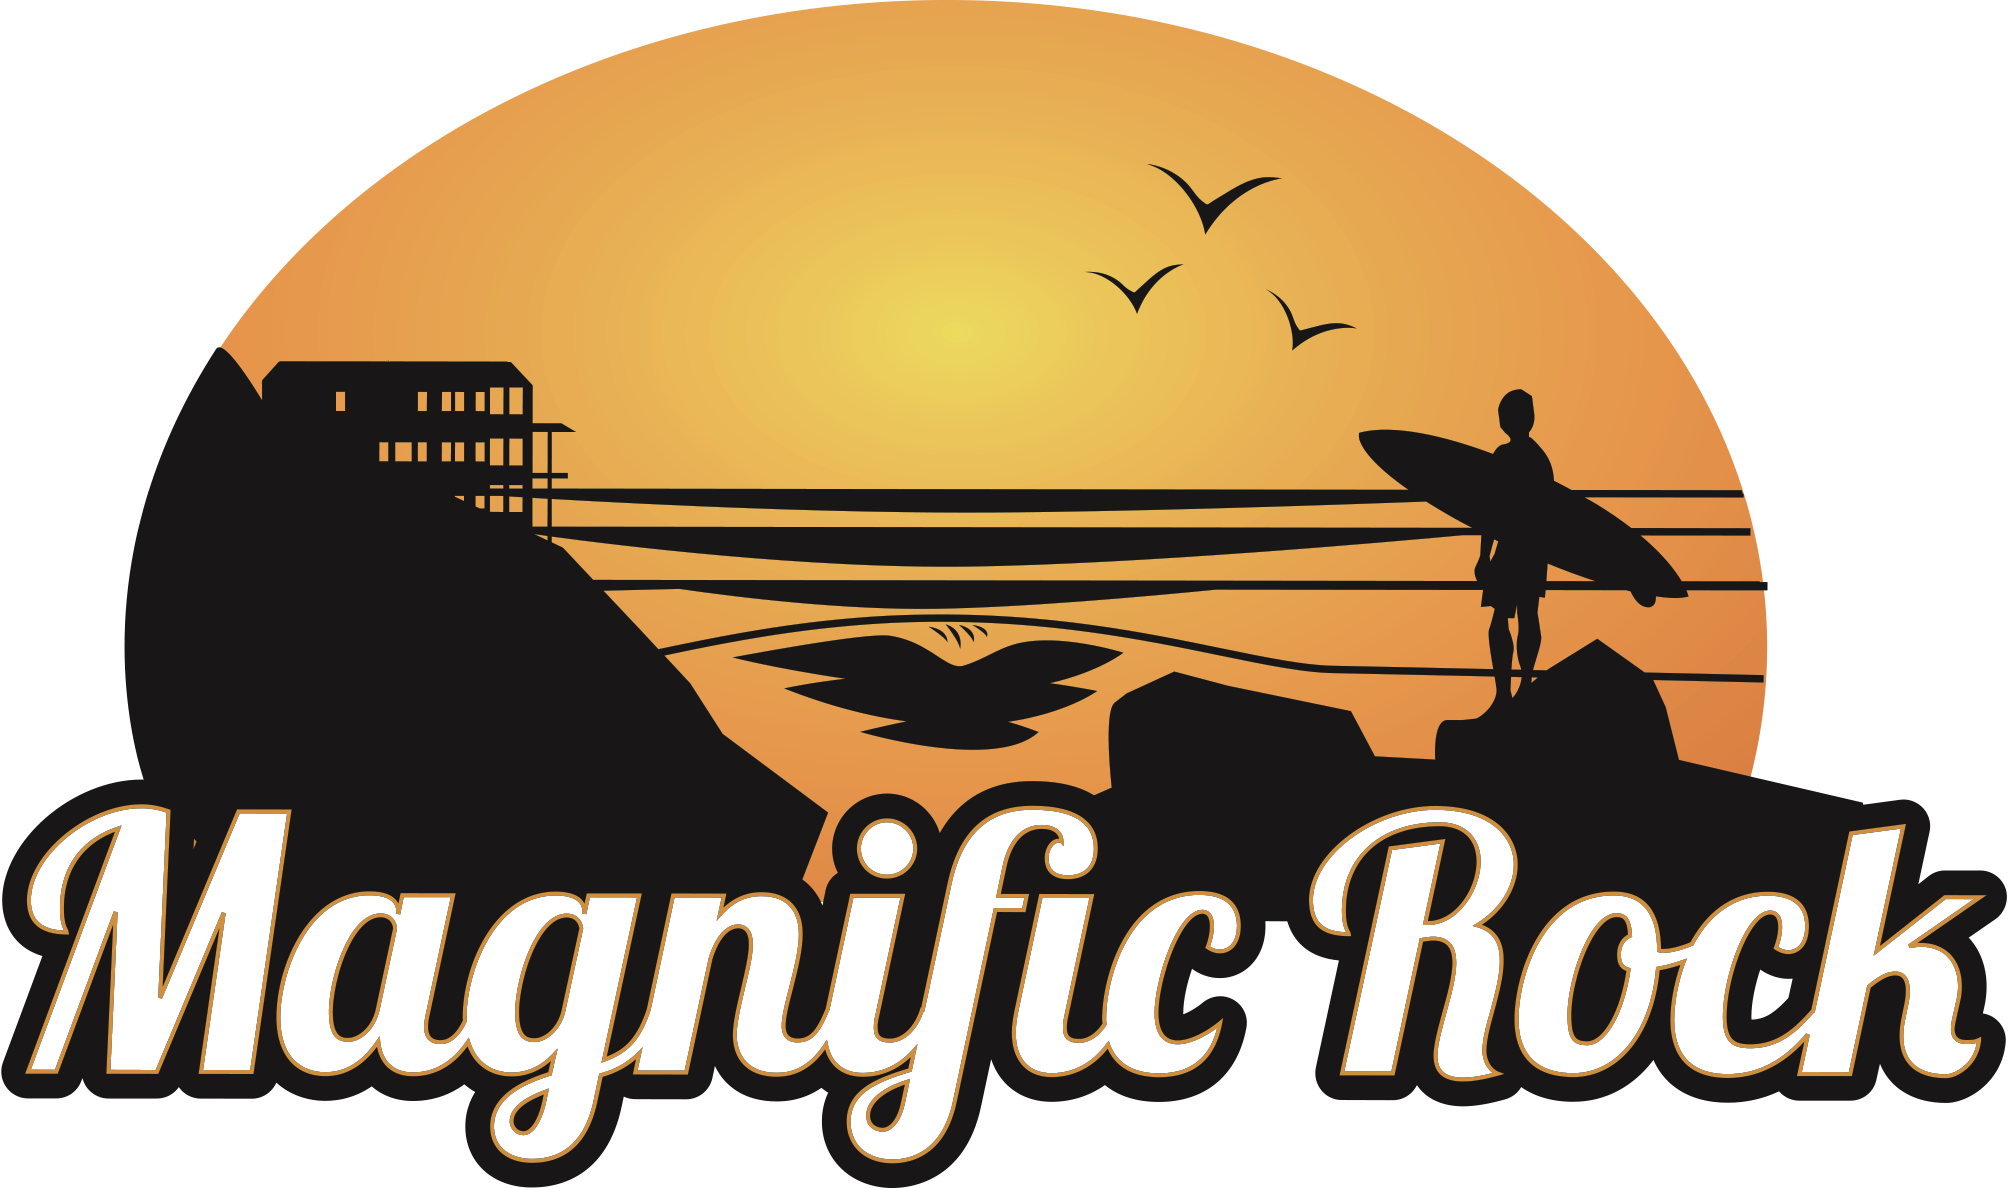 Magnific Rock | Nicaragua Surf Camp& Yoga Retreat